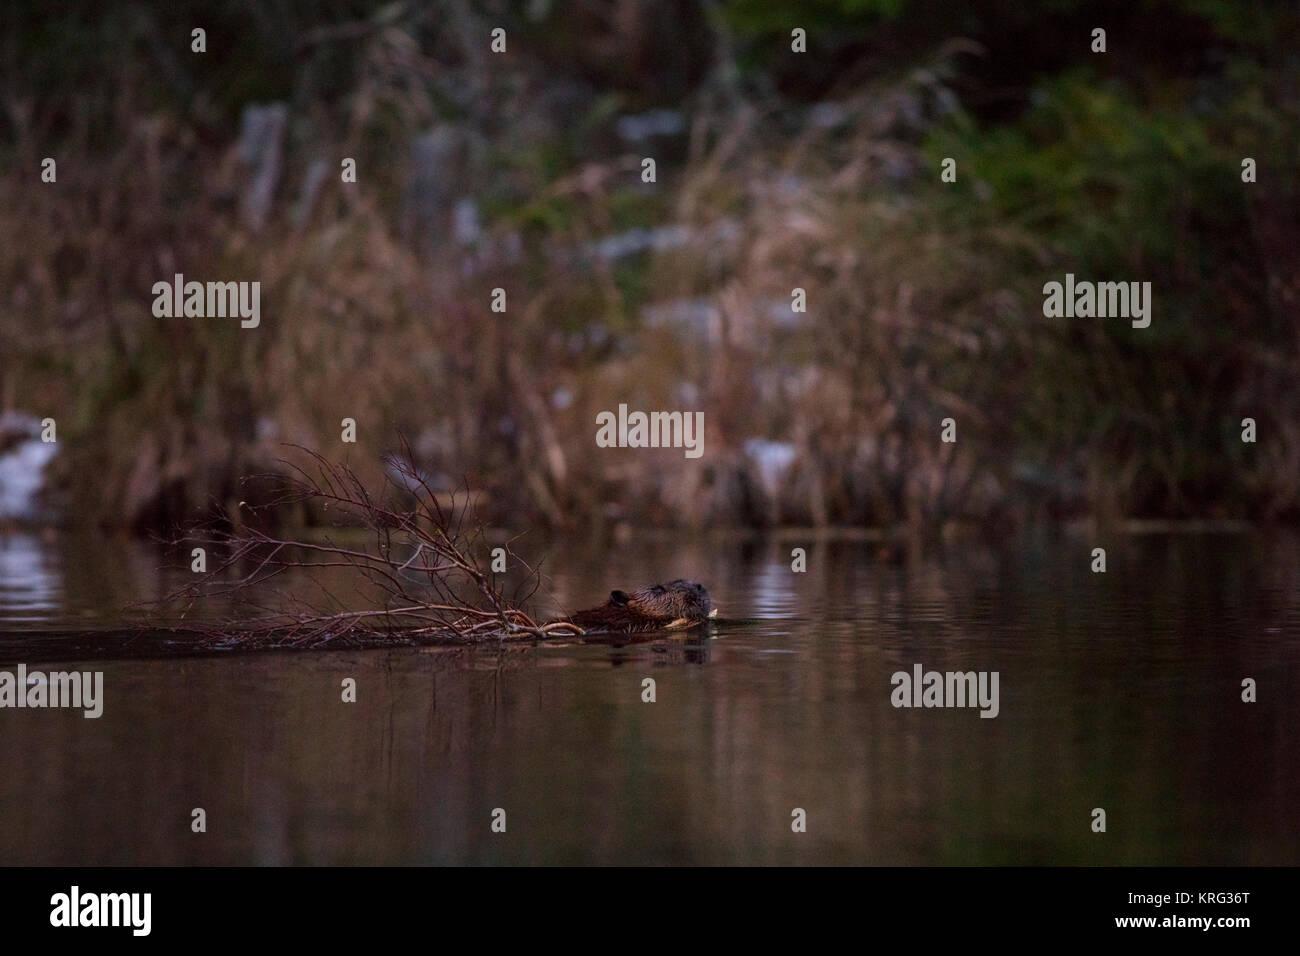 MAYNOOTH, HASTINGS HIGHLANDS, ONTARIO, CANADA - November 13, 2017: A North American Beaver (Castor Canadensis). - Stock Image